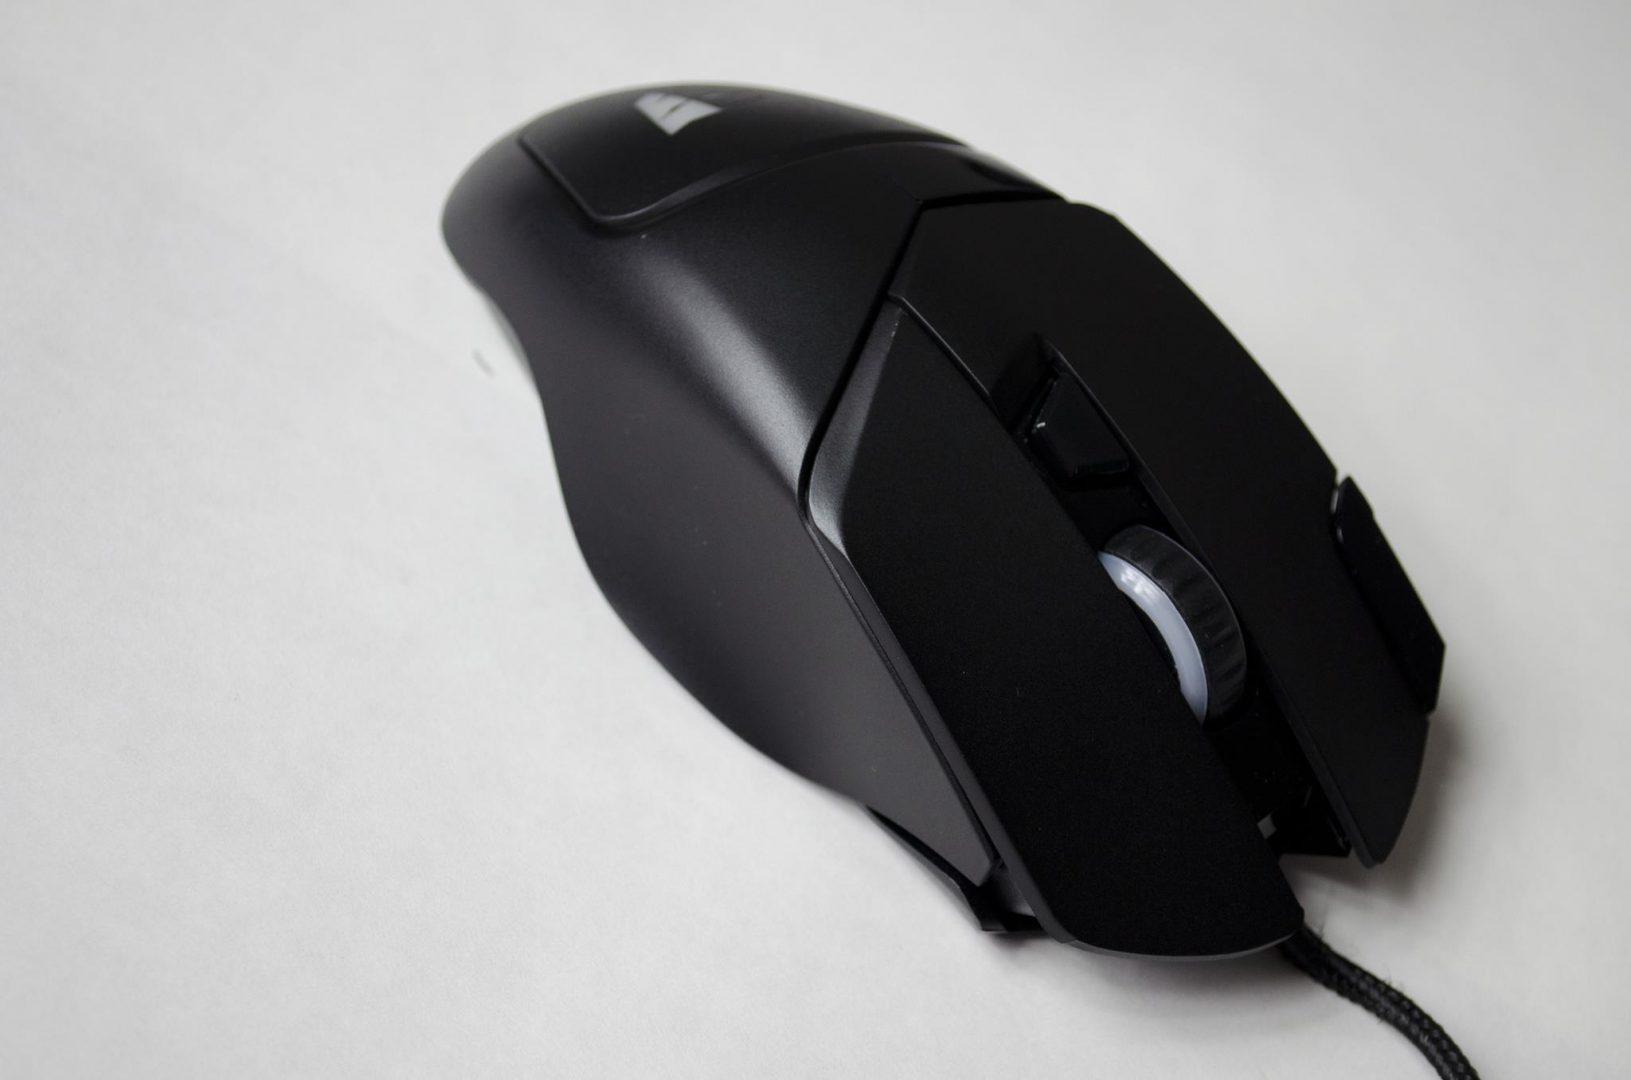 tesoro ascalon spectrum rgb gaming mouse_13